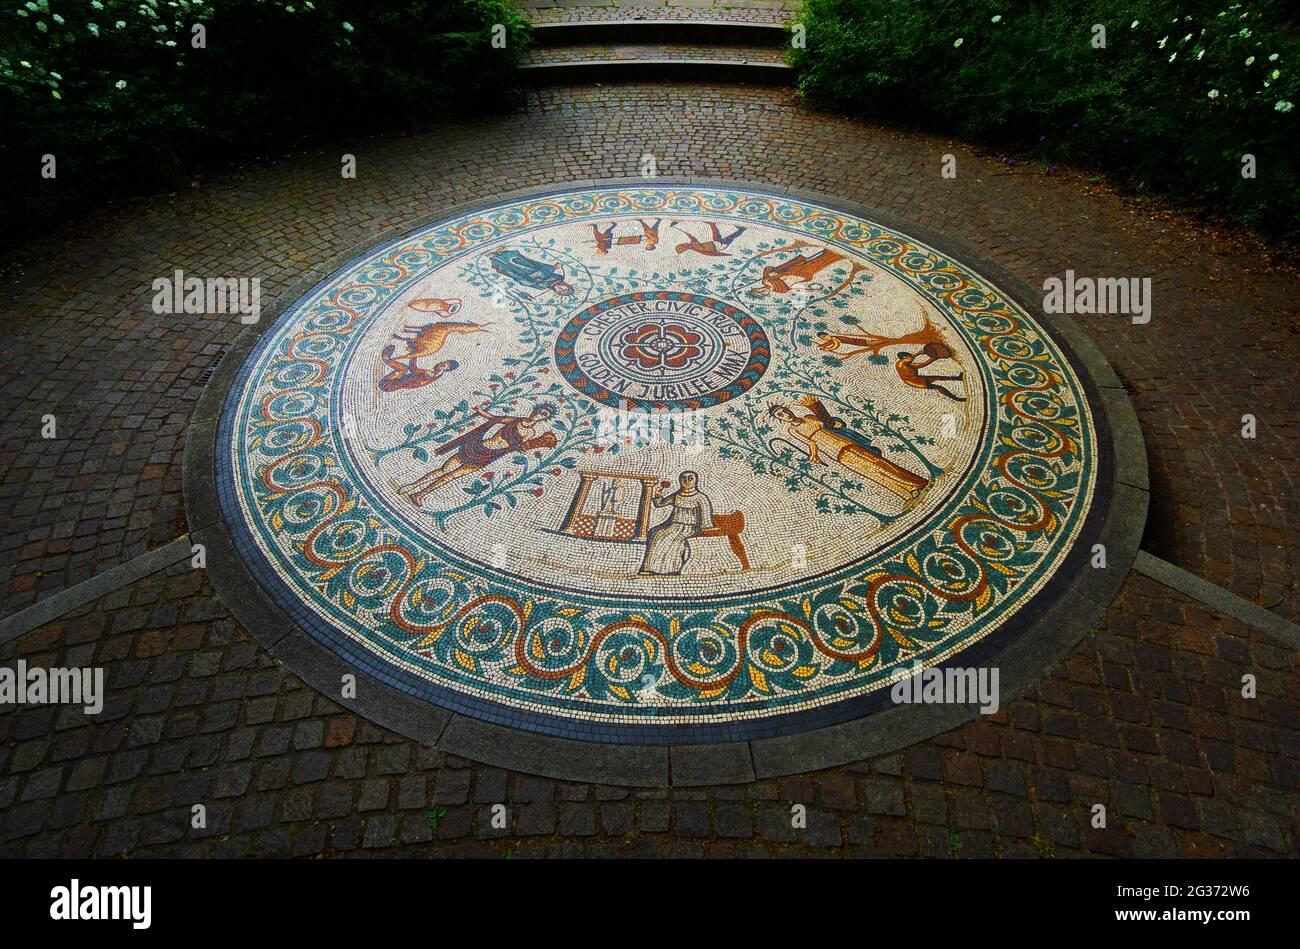 roman-gardens-in-chester-cheshire-2G372W